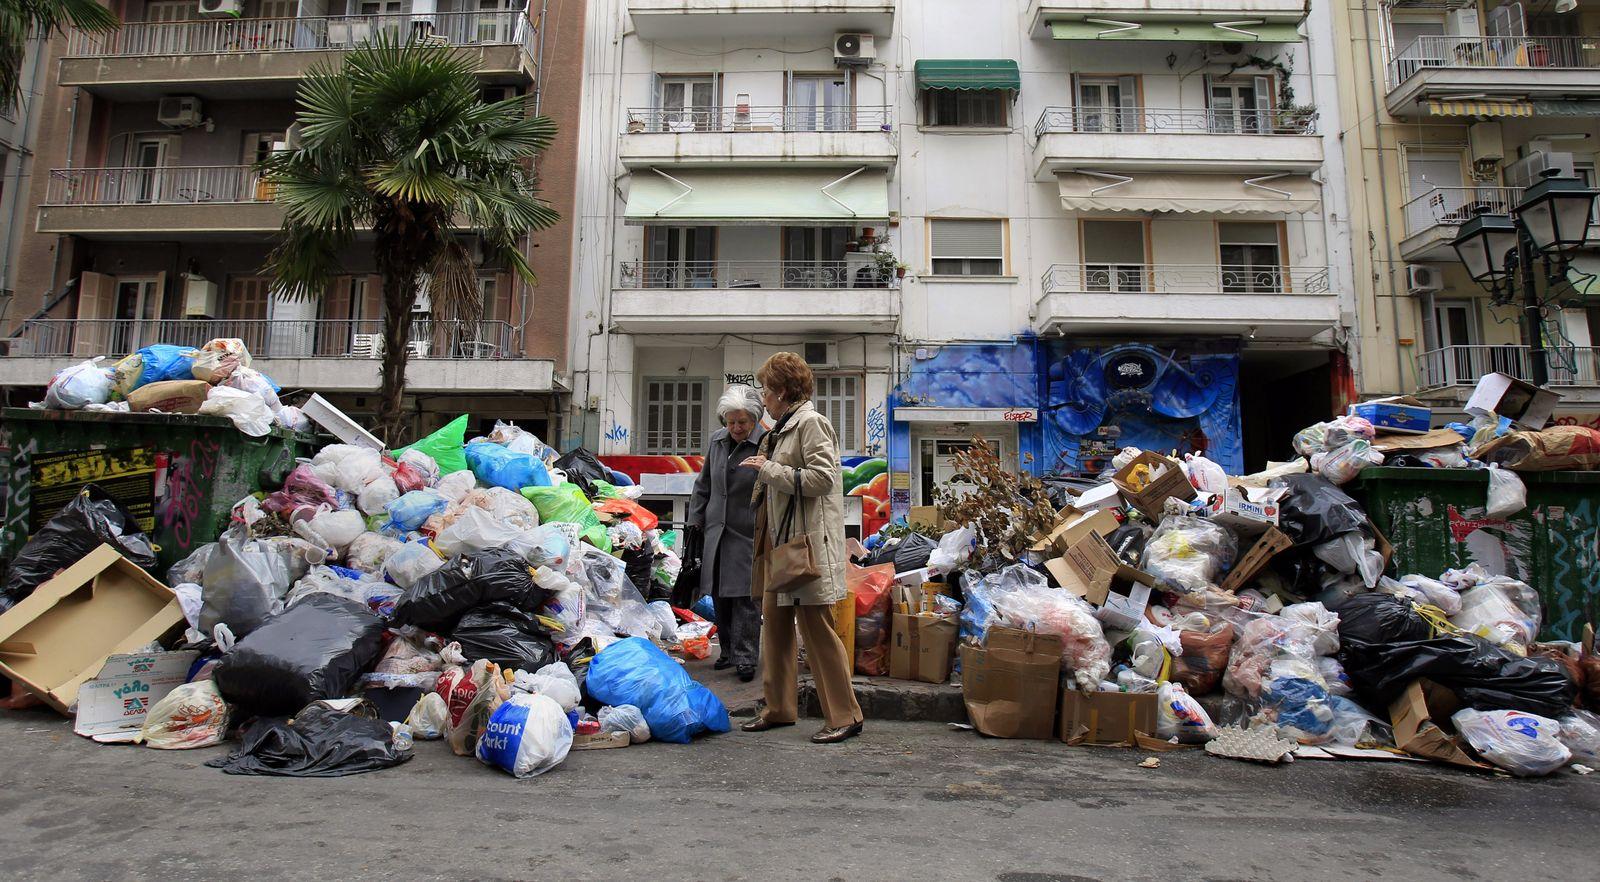 Griechenland Müllstreik Krise